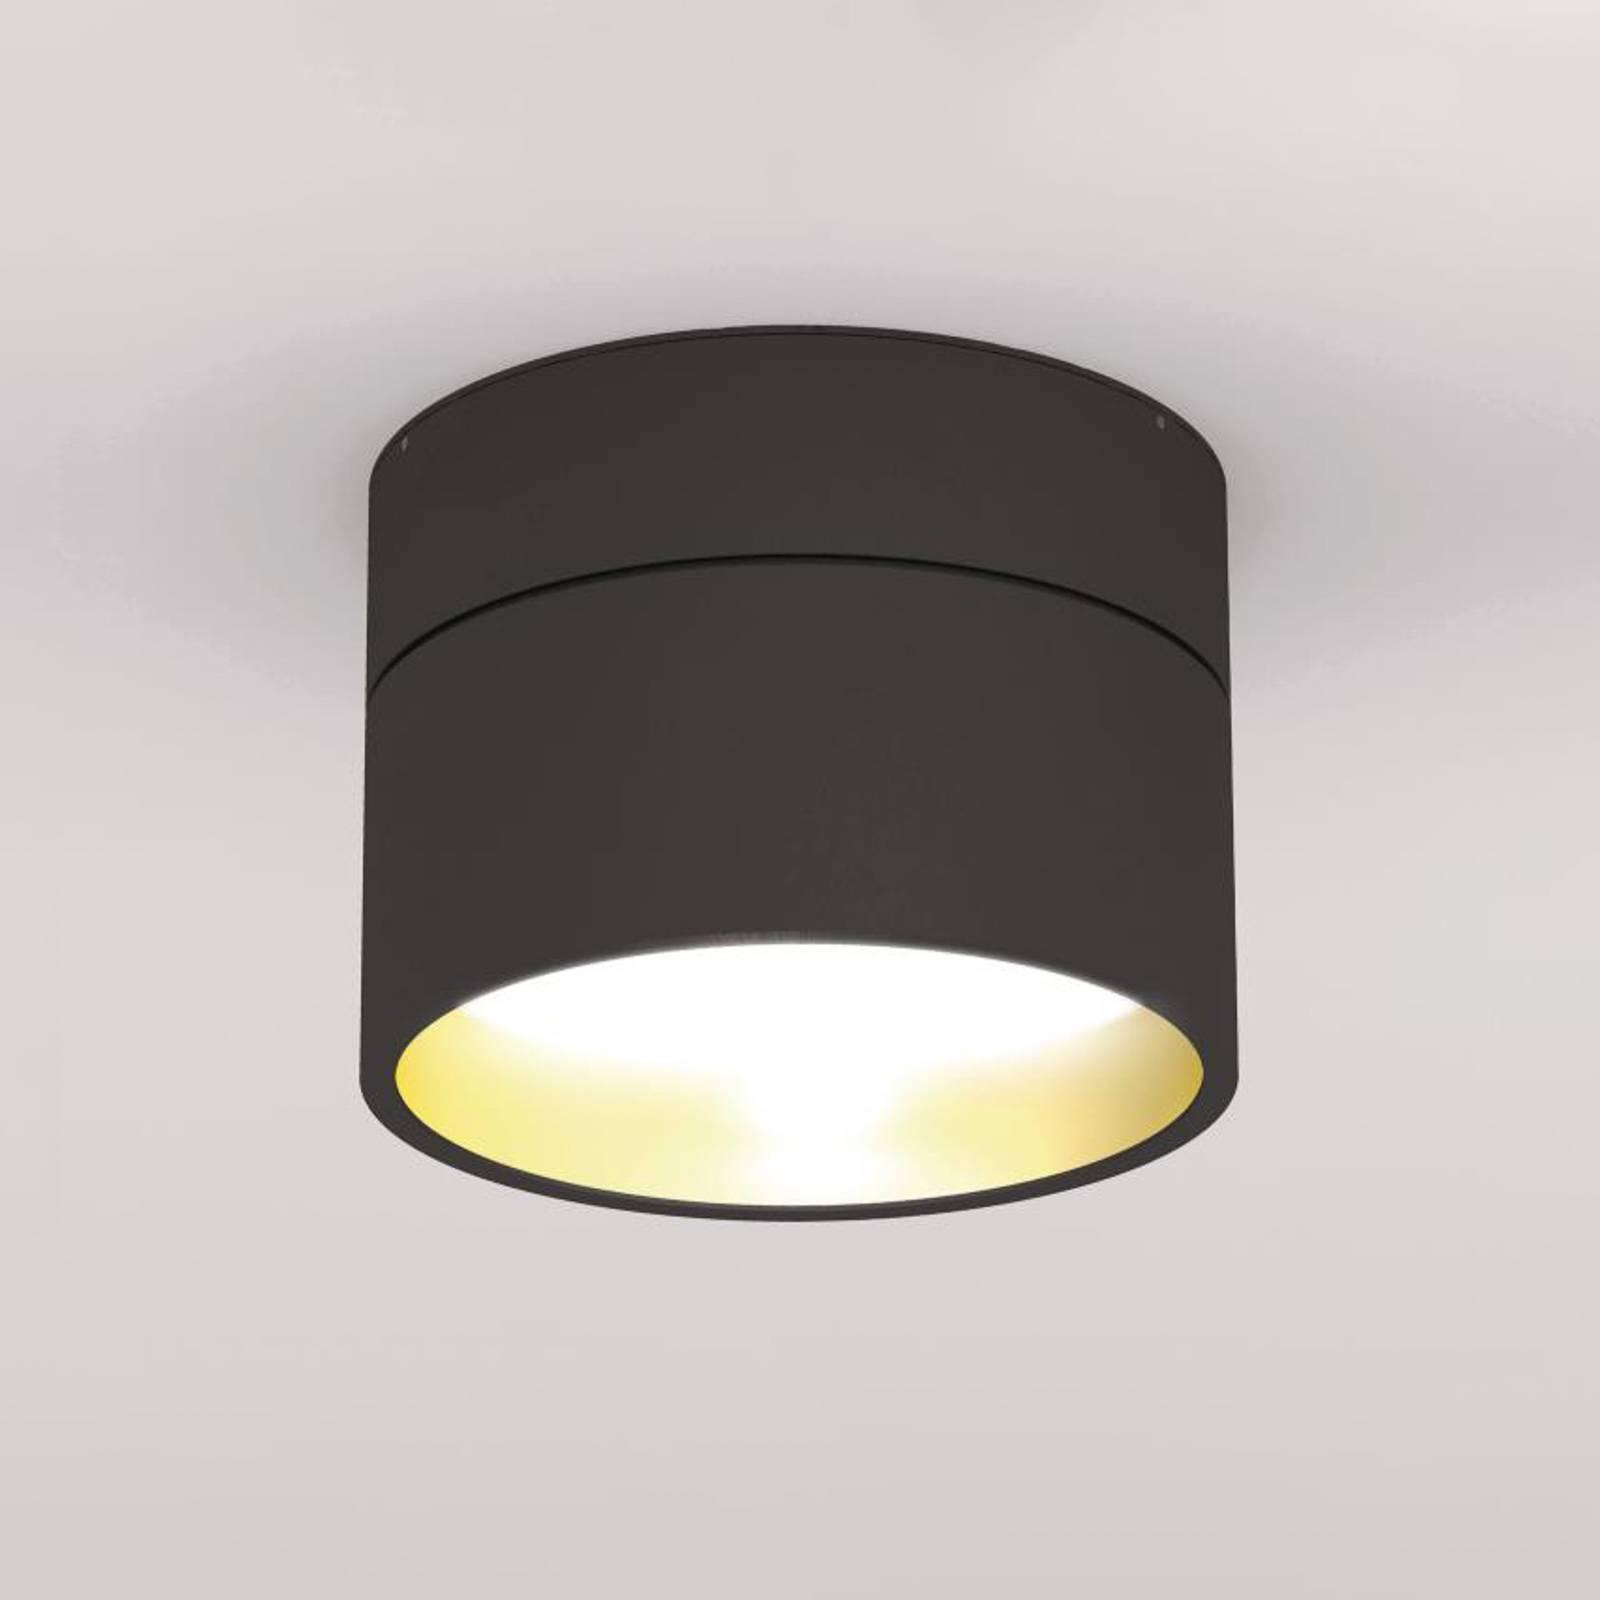 LOUM Turn on -LED-kattovalaisin dim musta/kulta